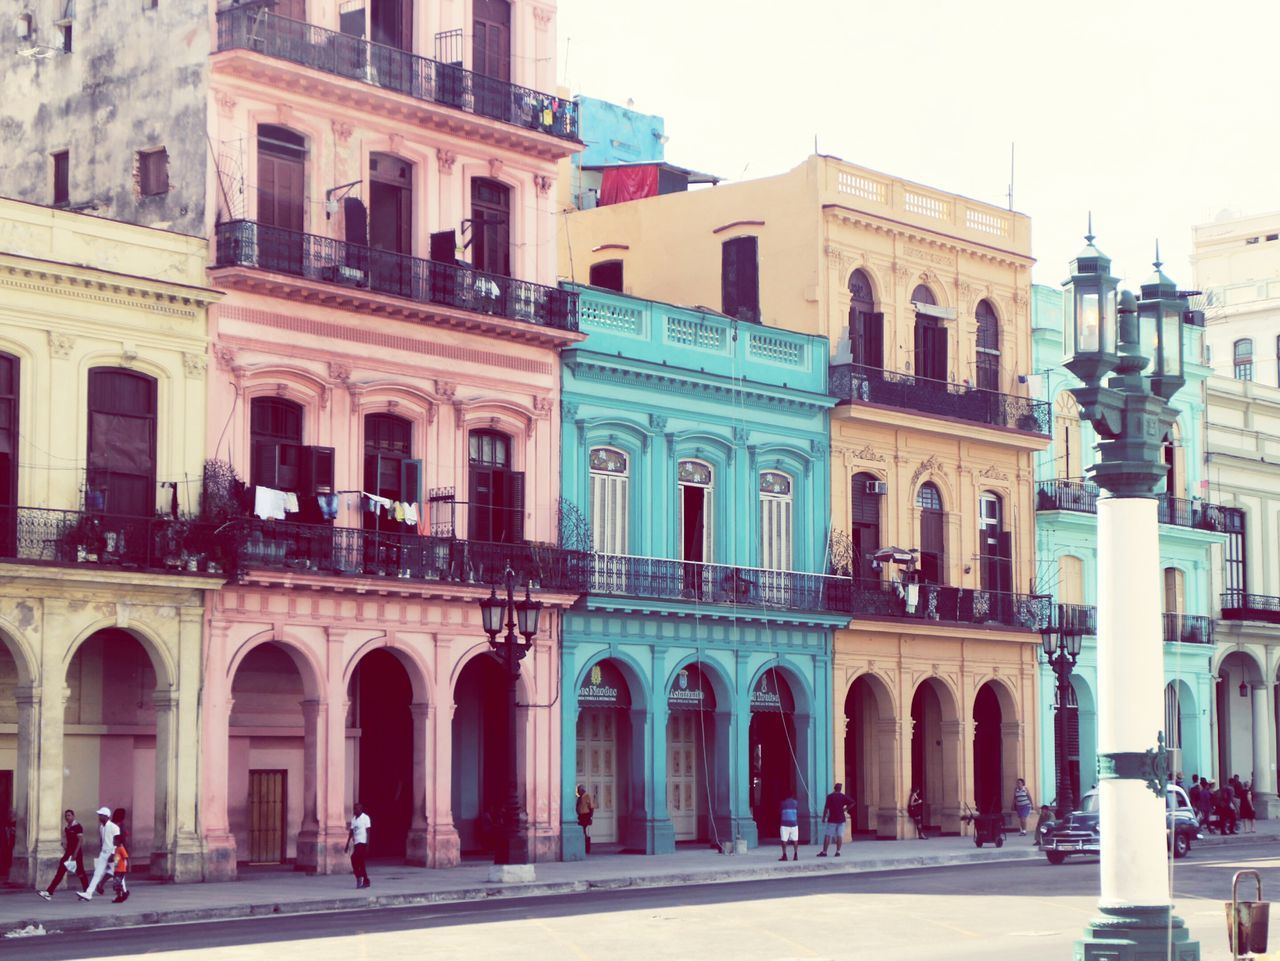 Havana Cuba Travel Photography The Traveler - 2015 EyeEm Awards Streetphotography The Great Outdoors - 2017 EyeEm Awards The Architect - 2017 EyeEm Awards